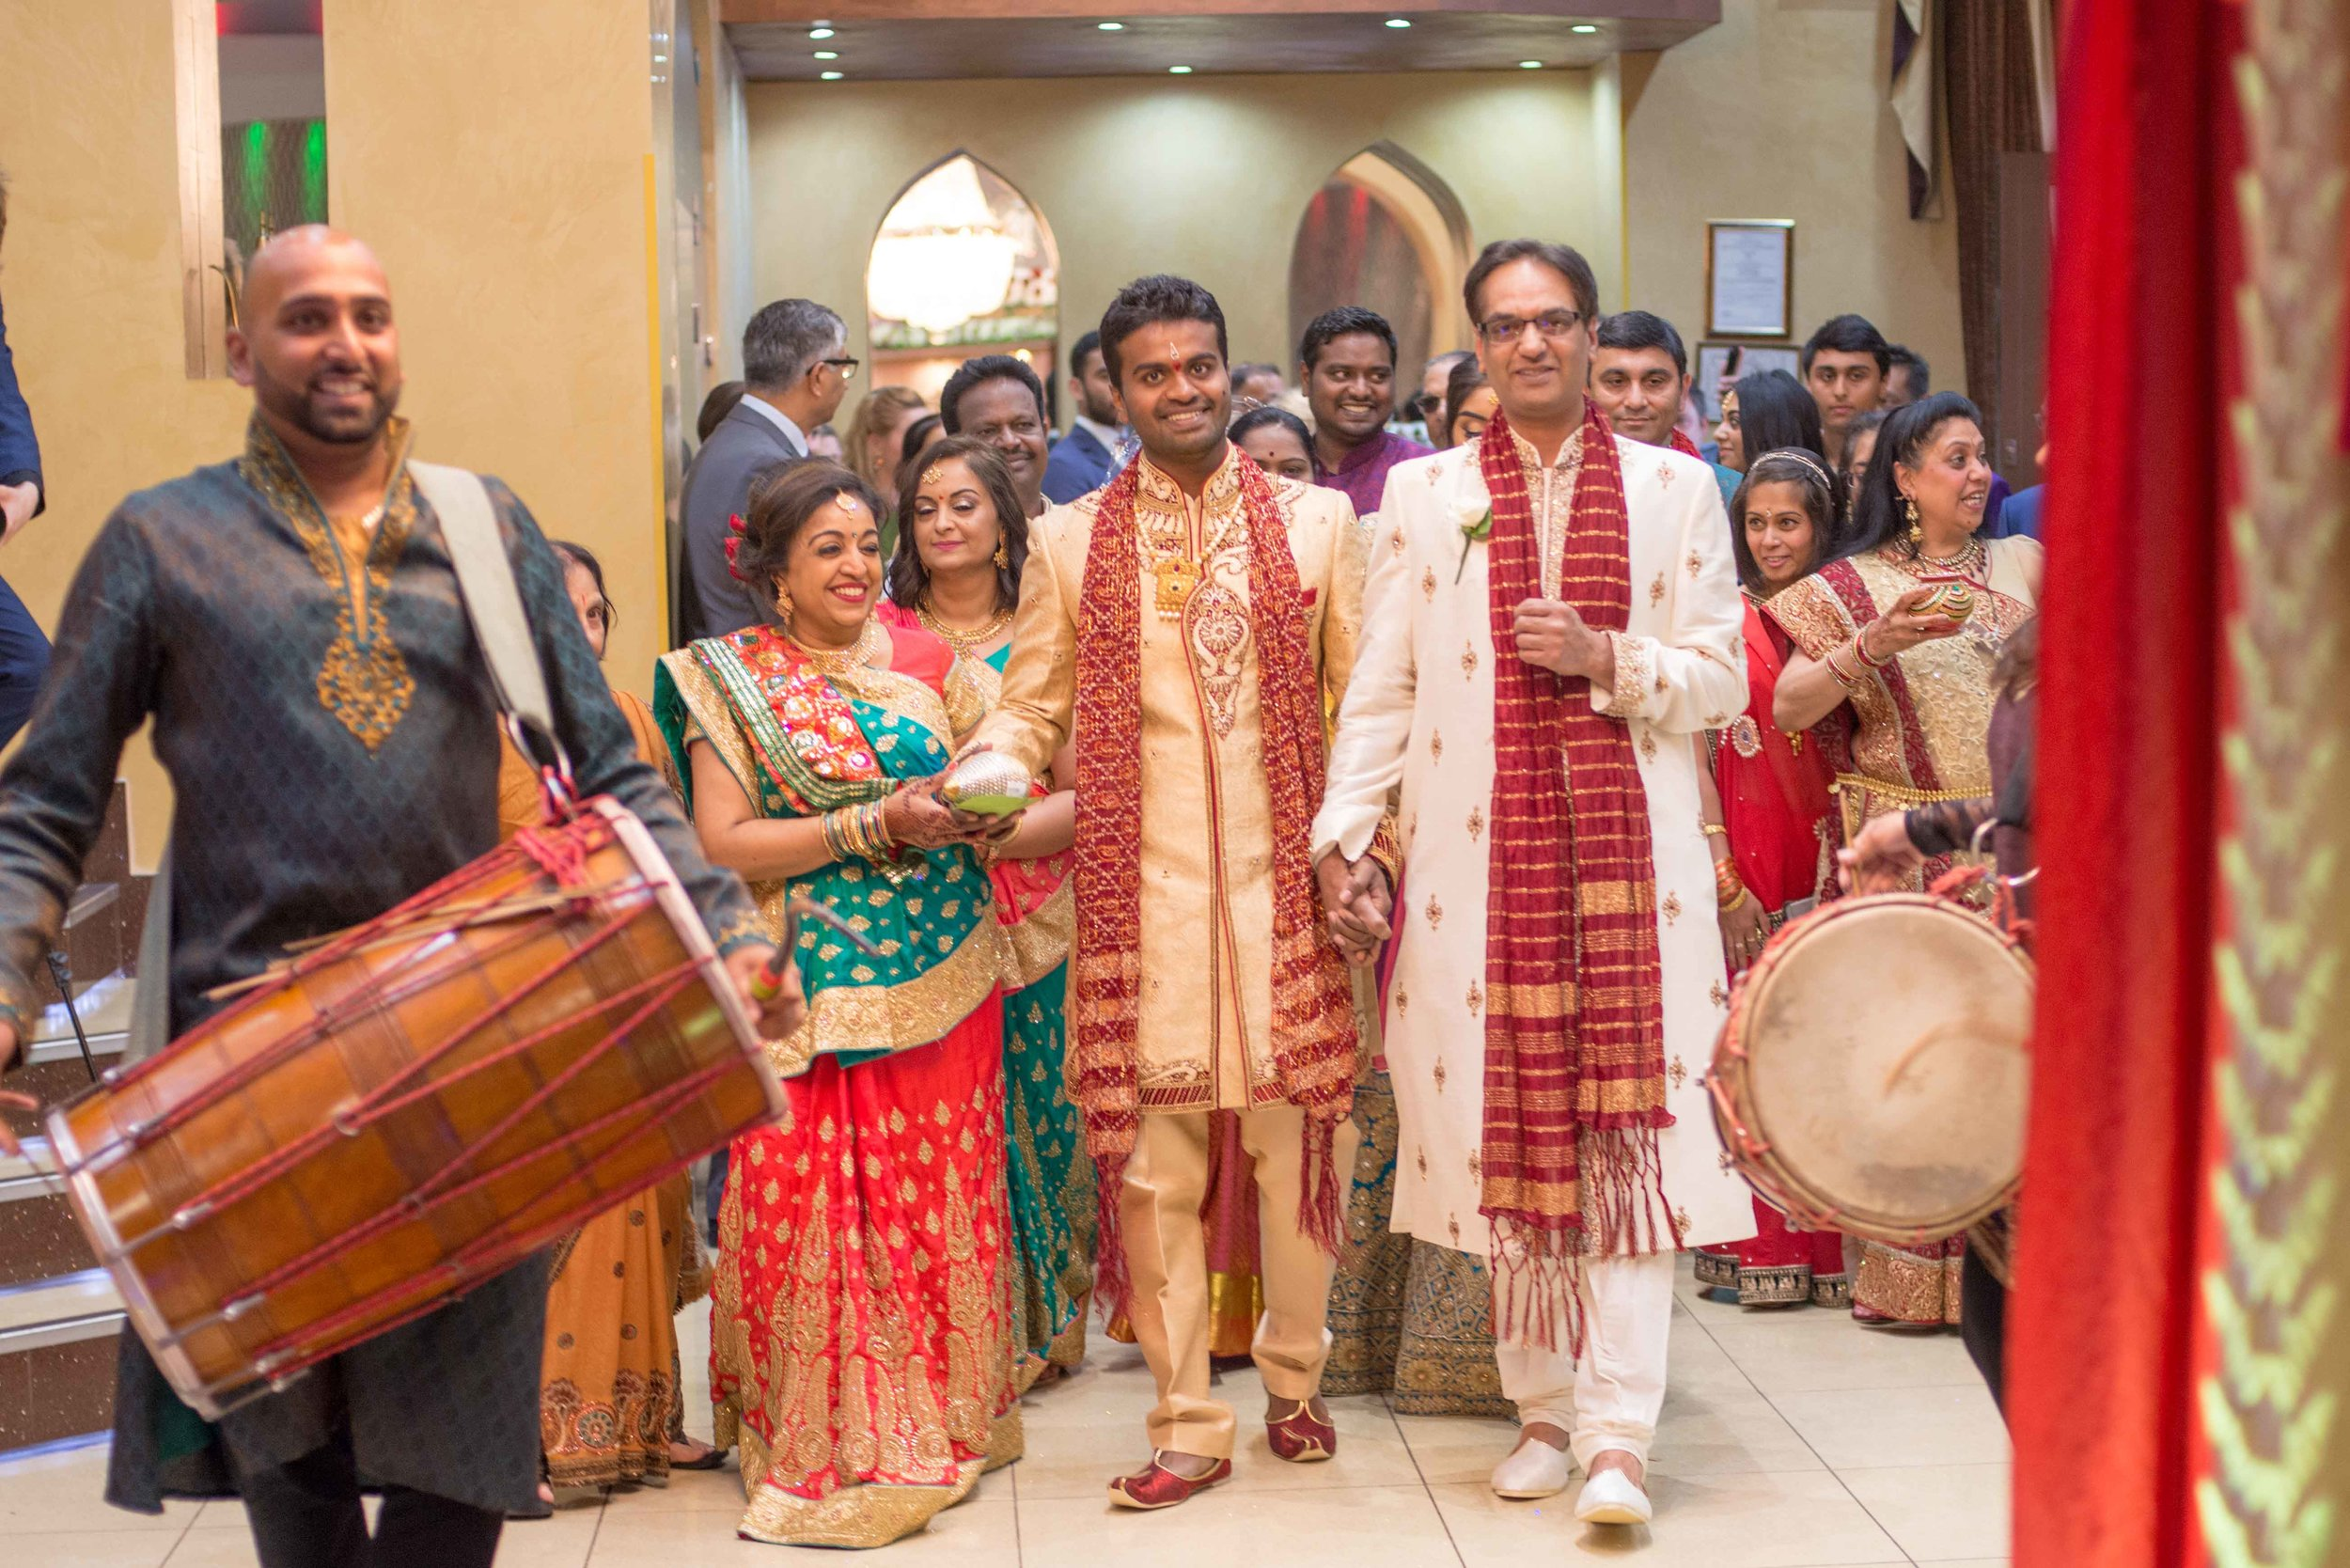 premier-banquetting-london-Hindu-asian-wedding-photographer-natalia-smith-photography-14.jpg